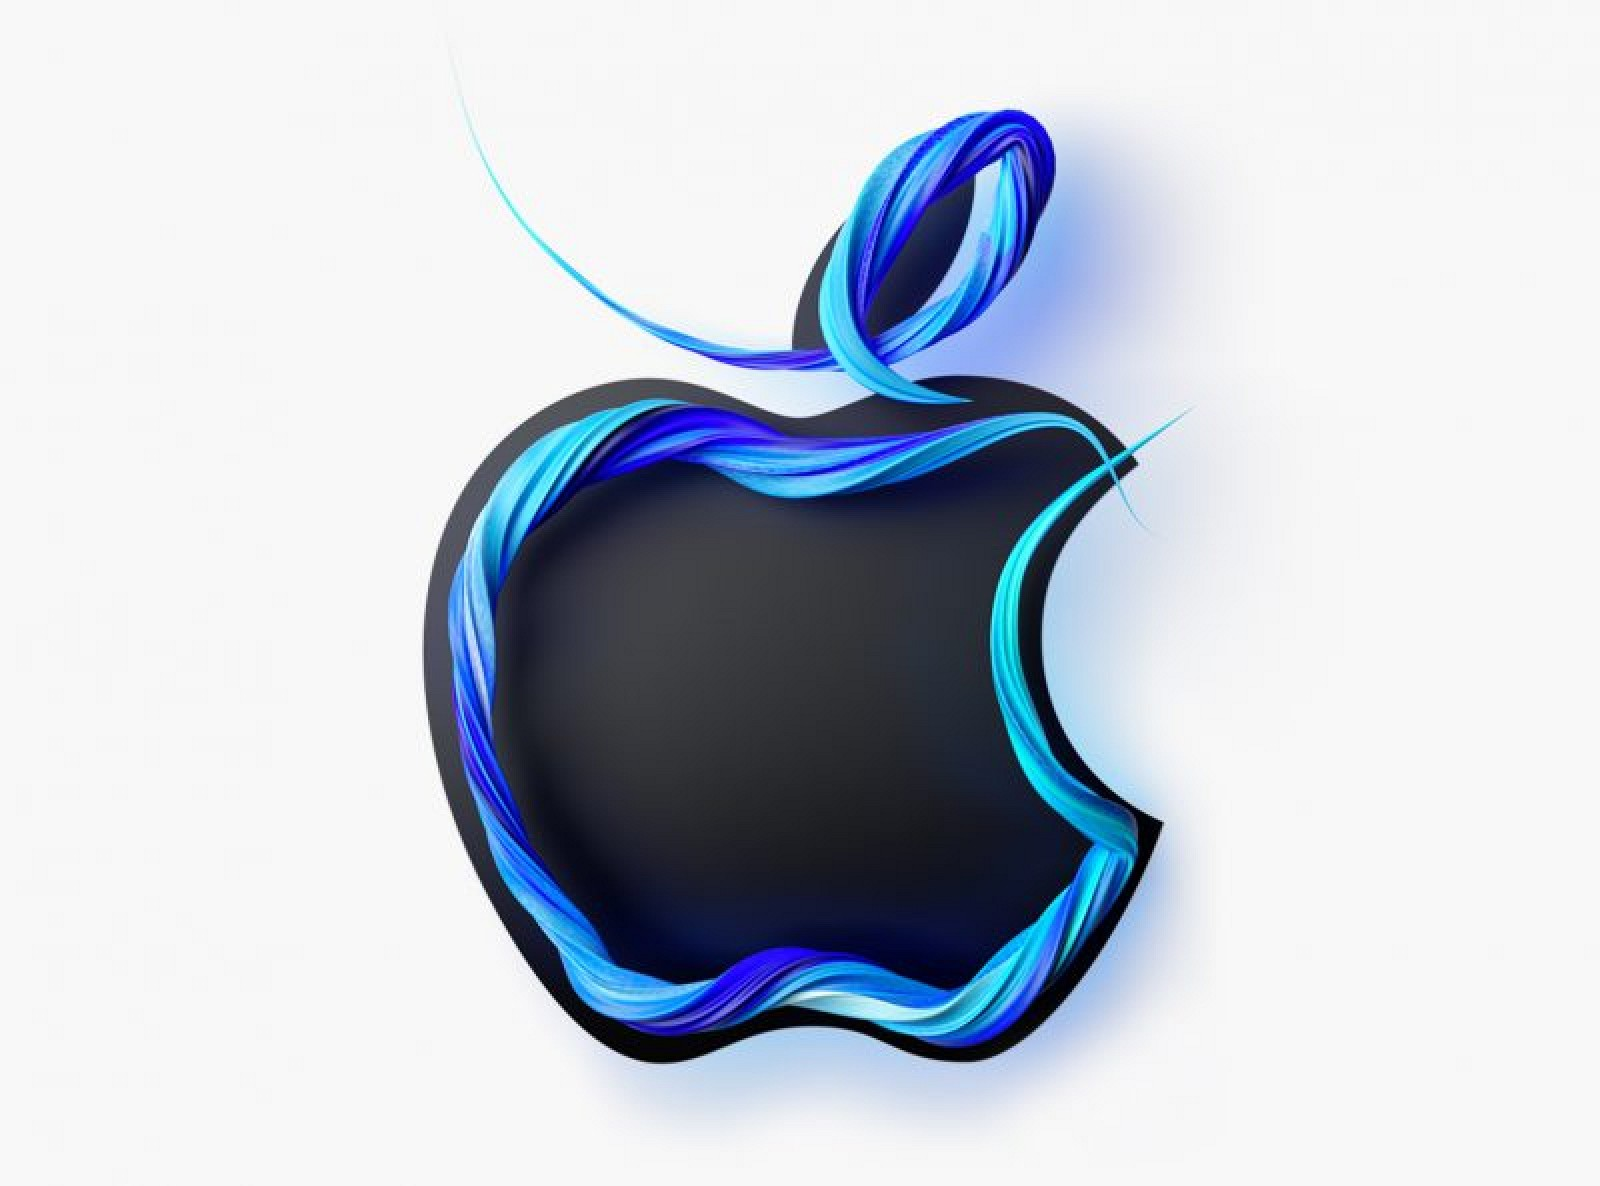 c9f6713e63eb5 MacRumors: Apple Mac iPhone Rumors and News